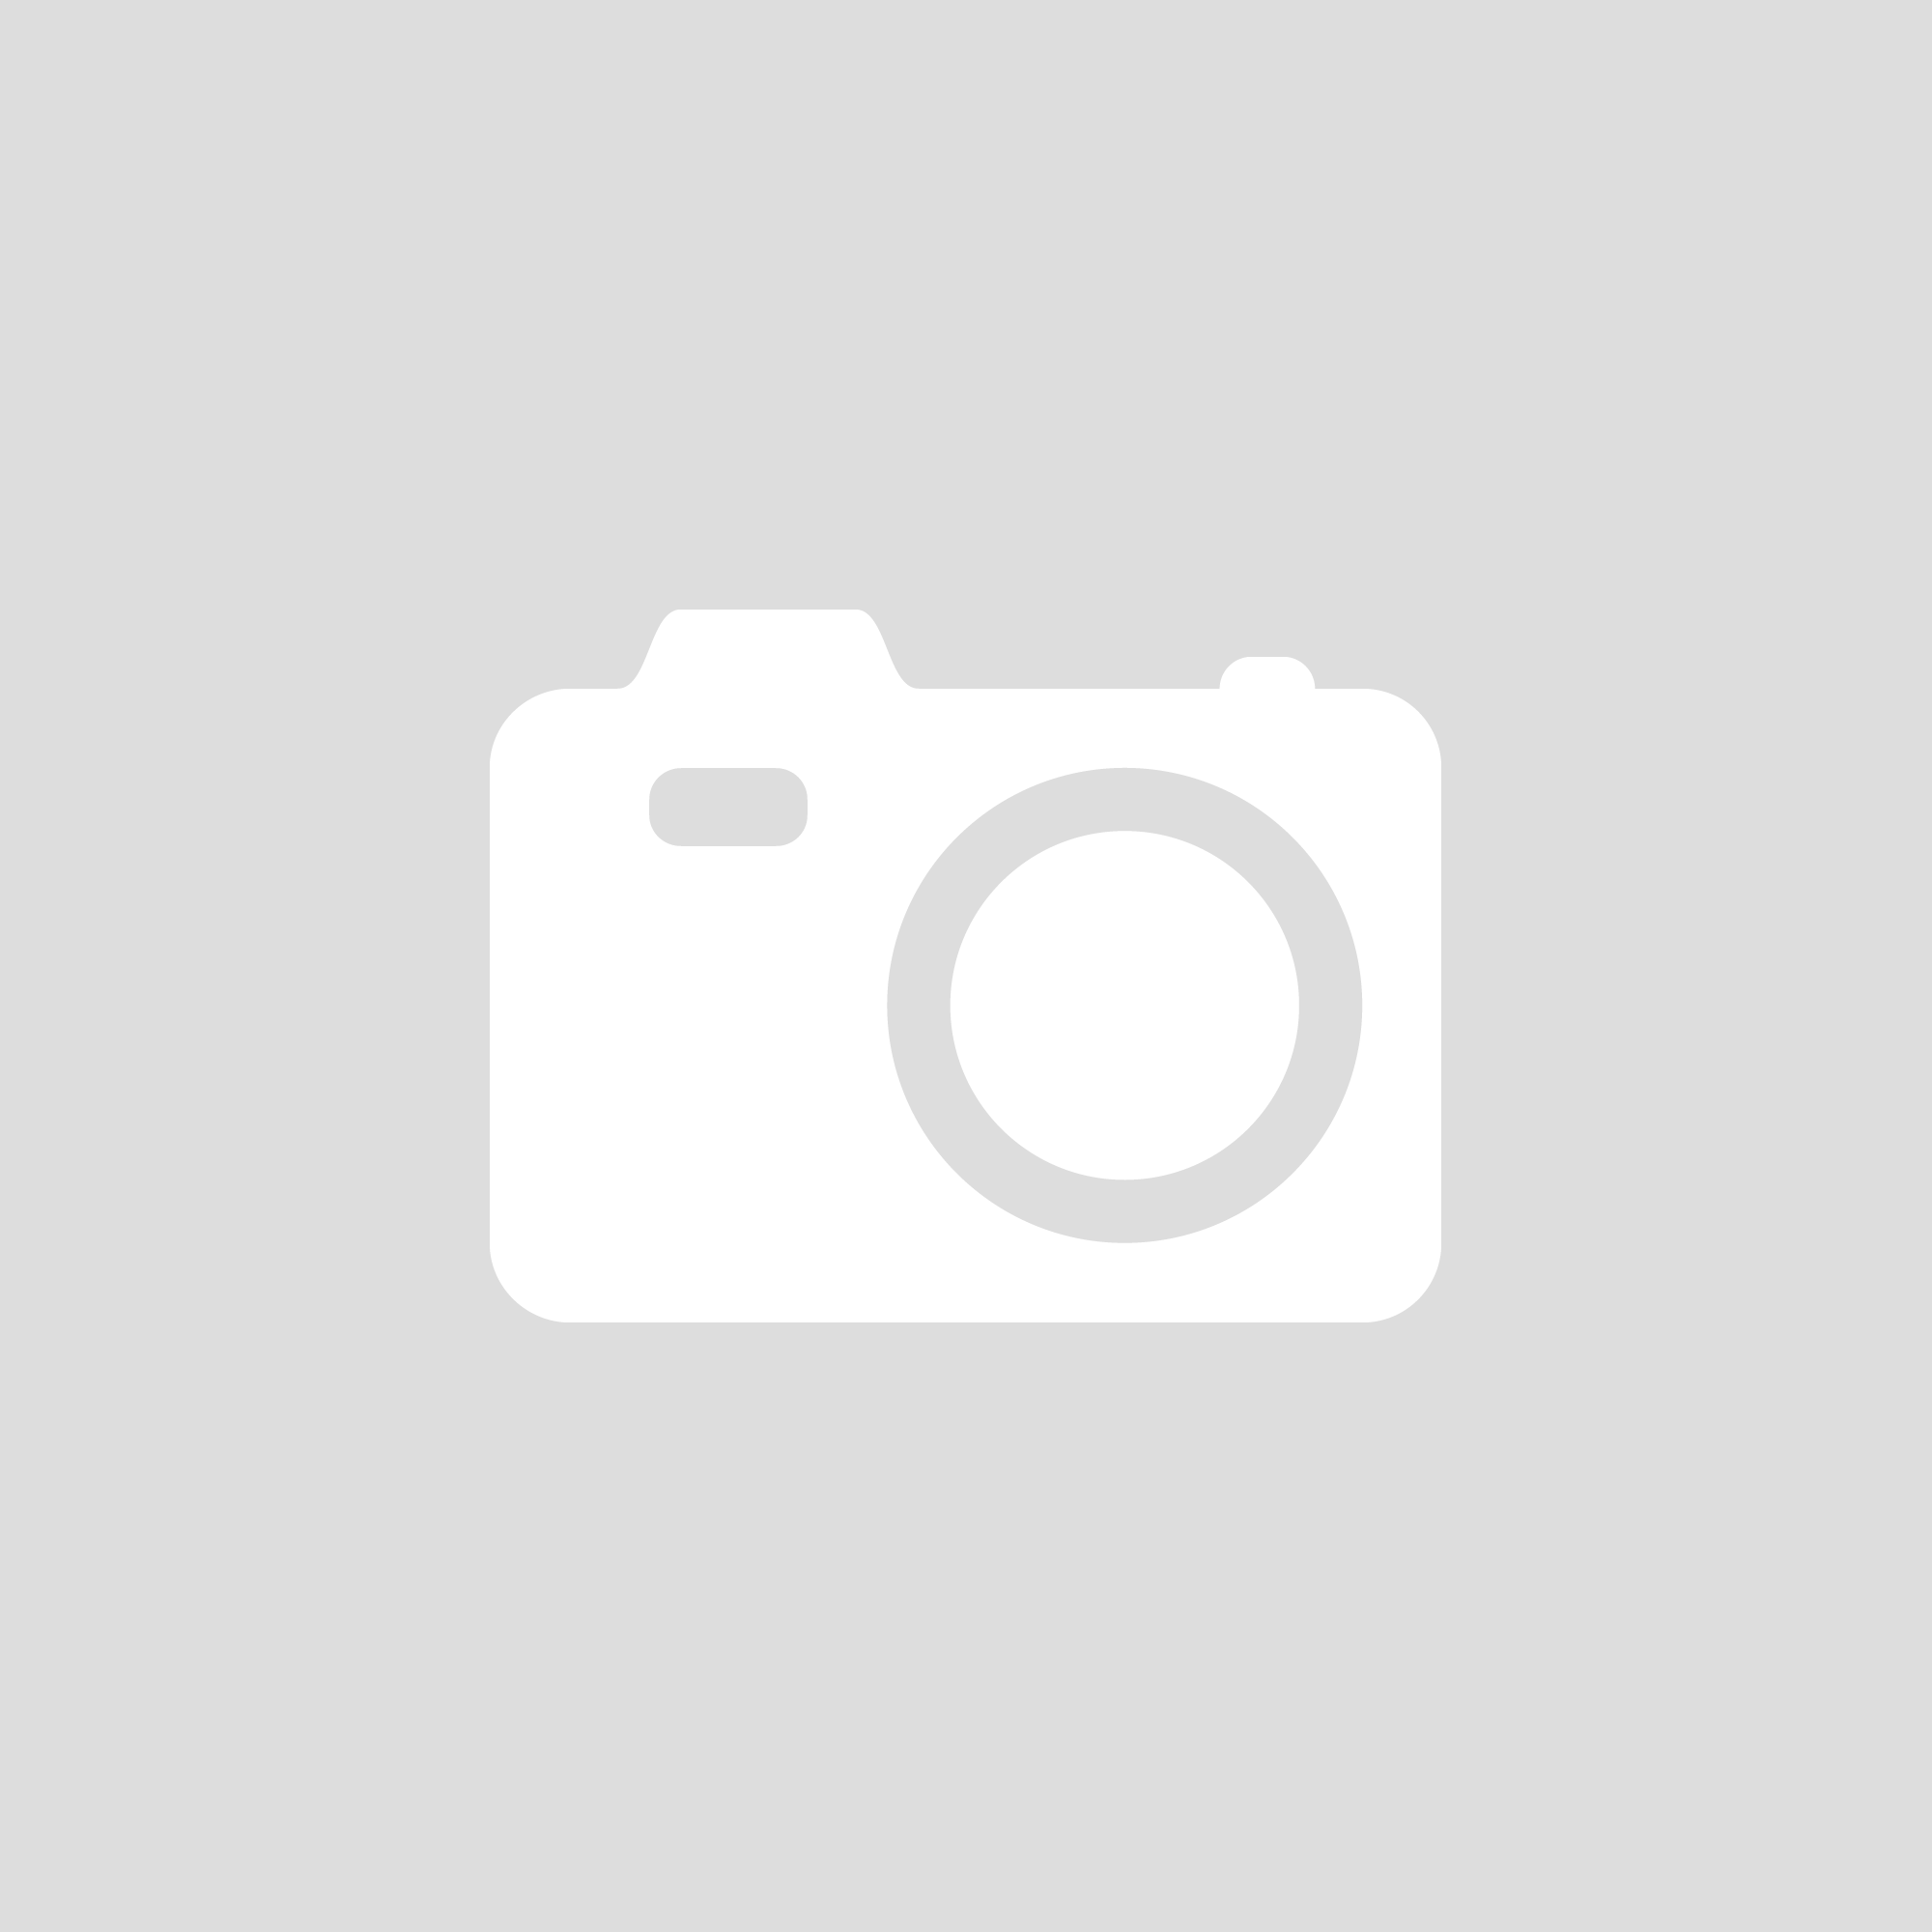 Tiffany Platinum Green / Cream Wallpaper by Belgravia GB 164